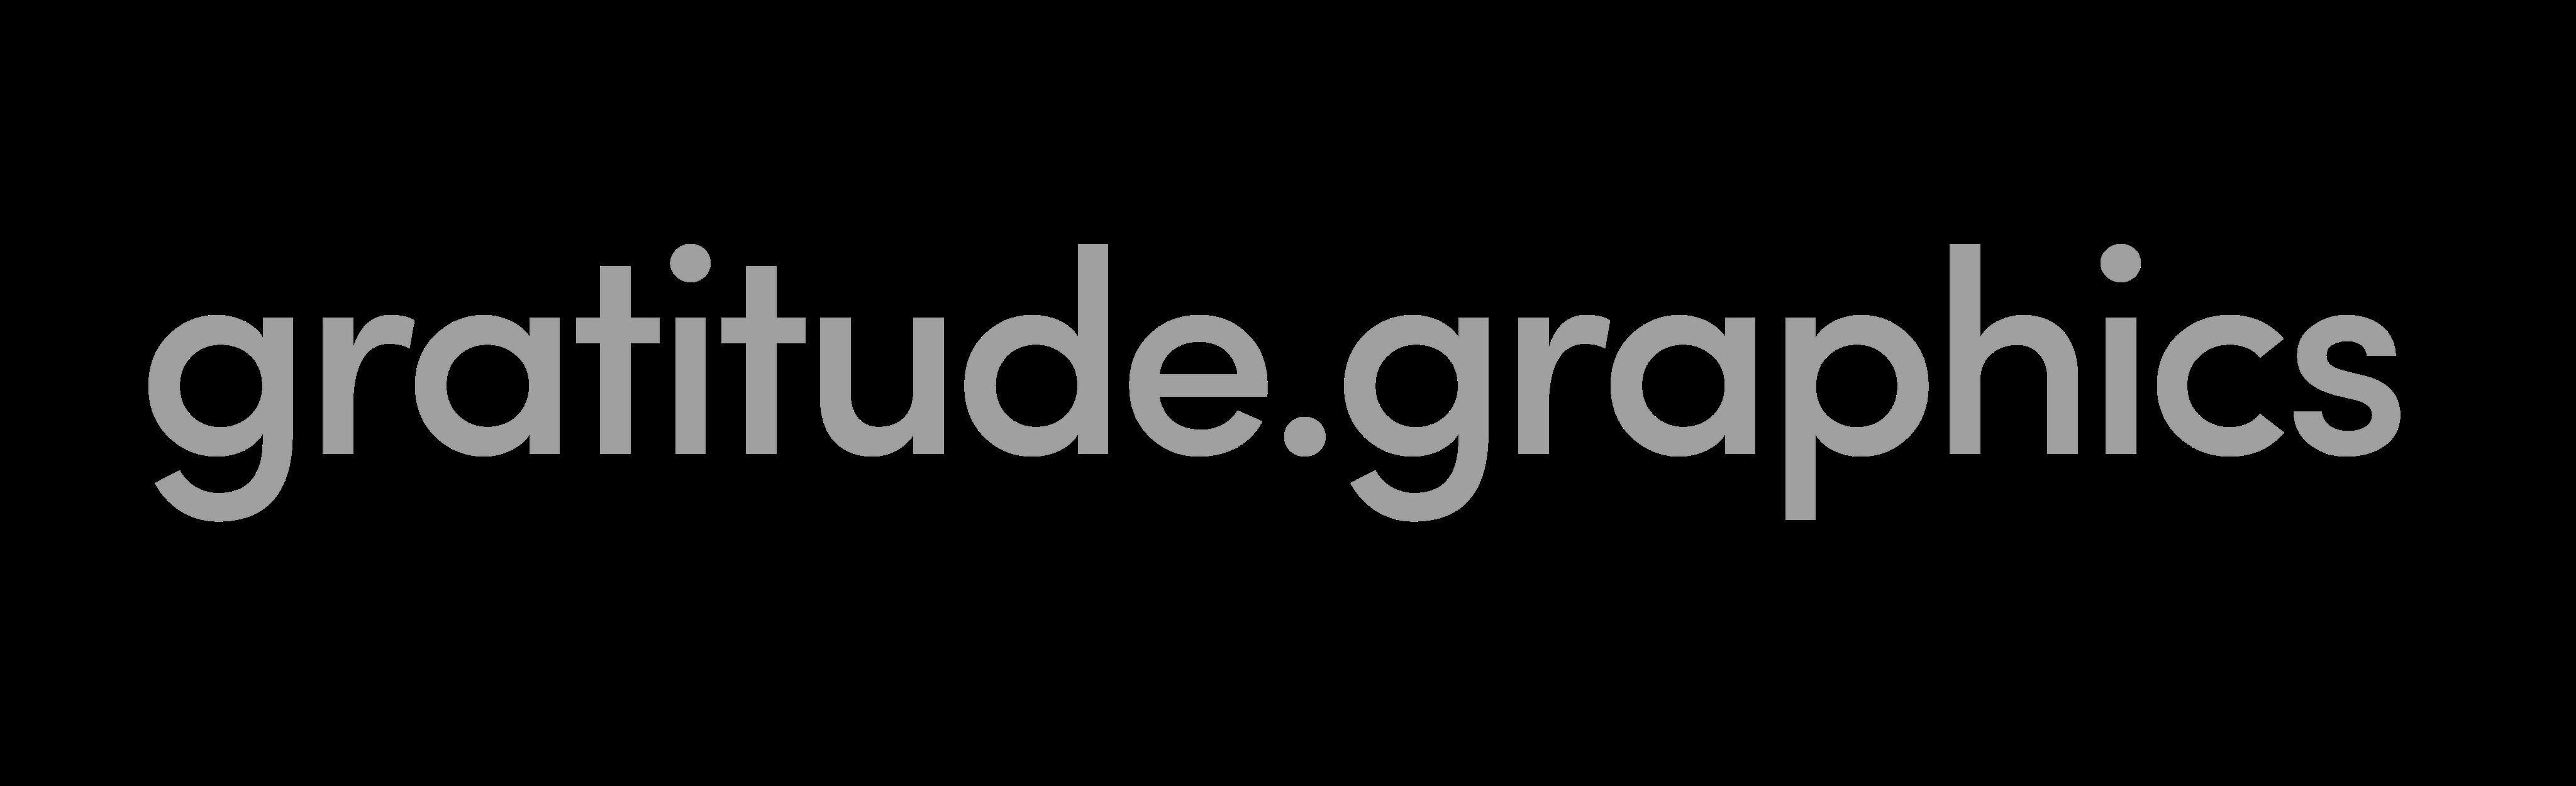 gratitude graphics